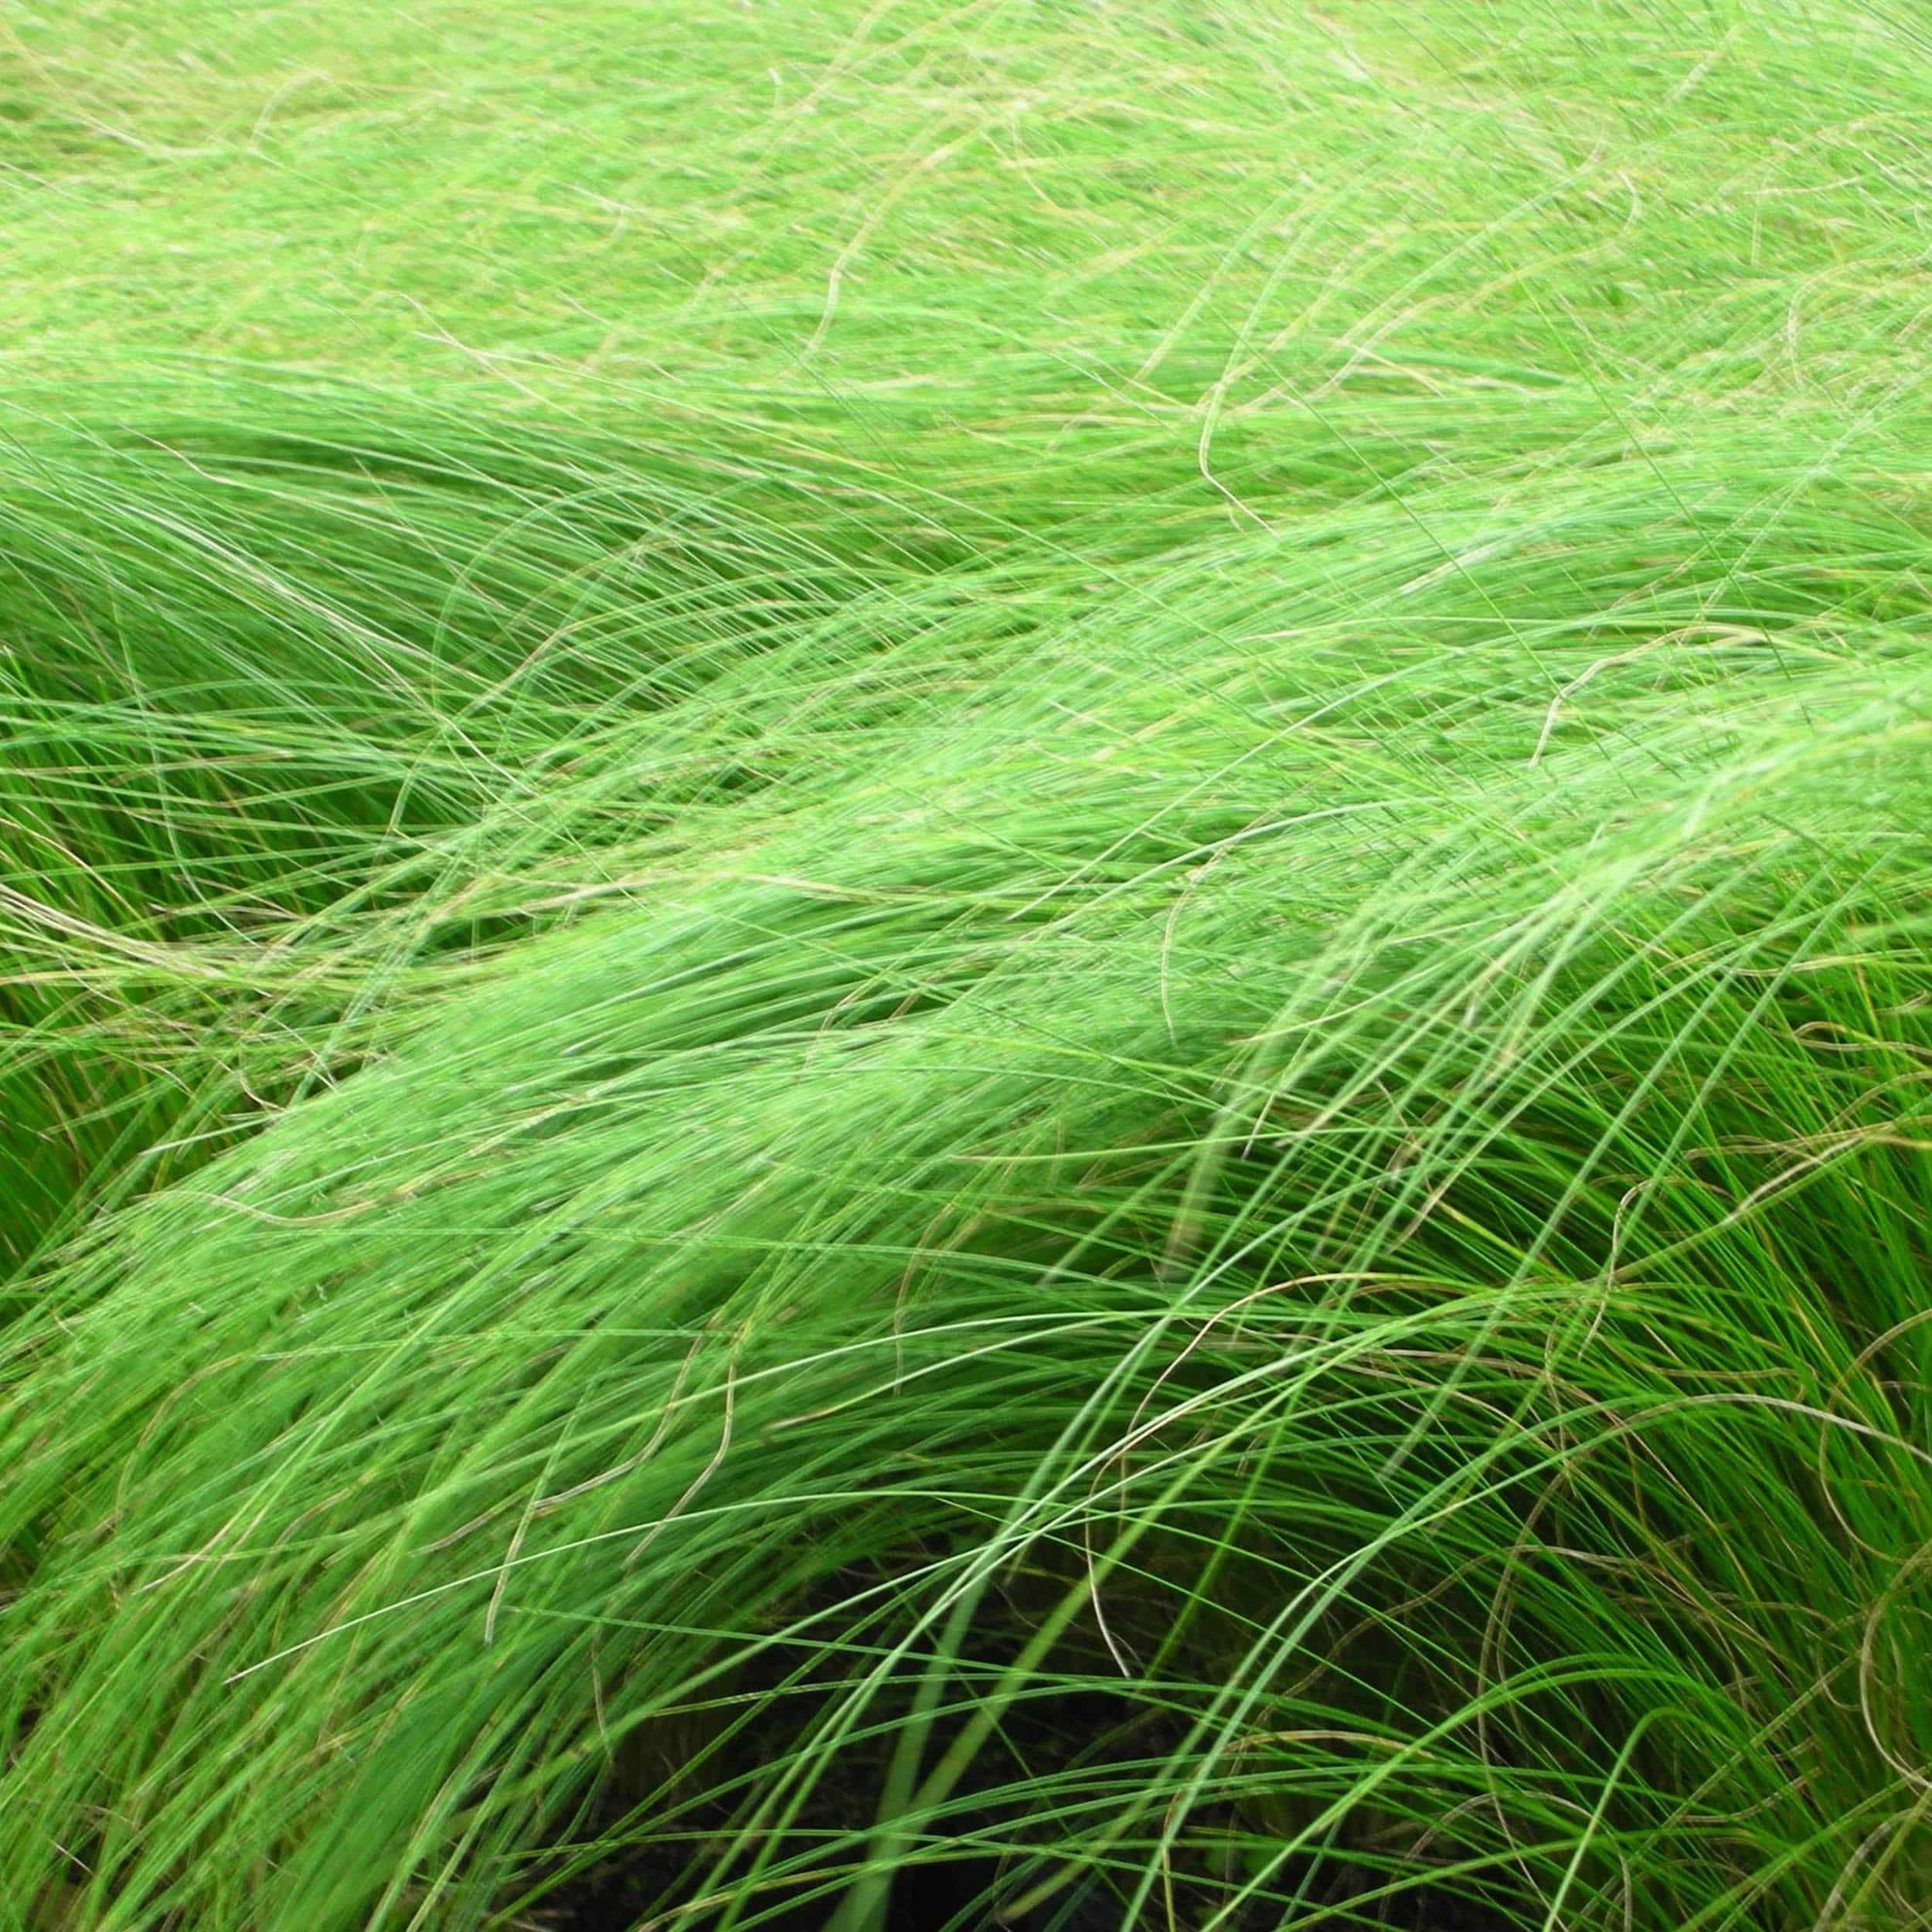 Stipa tenuissima - Zartes Federgras